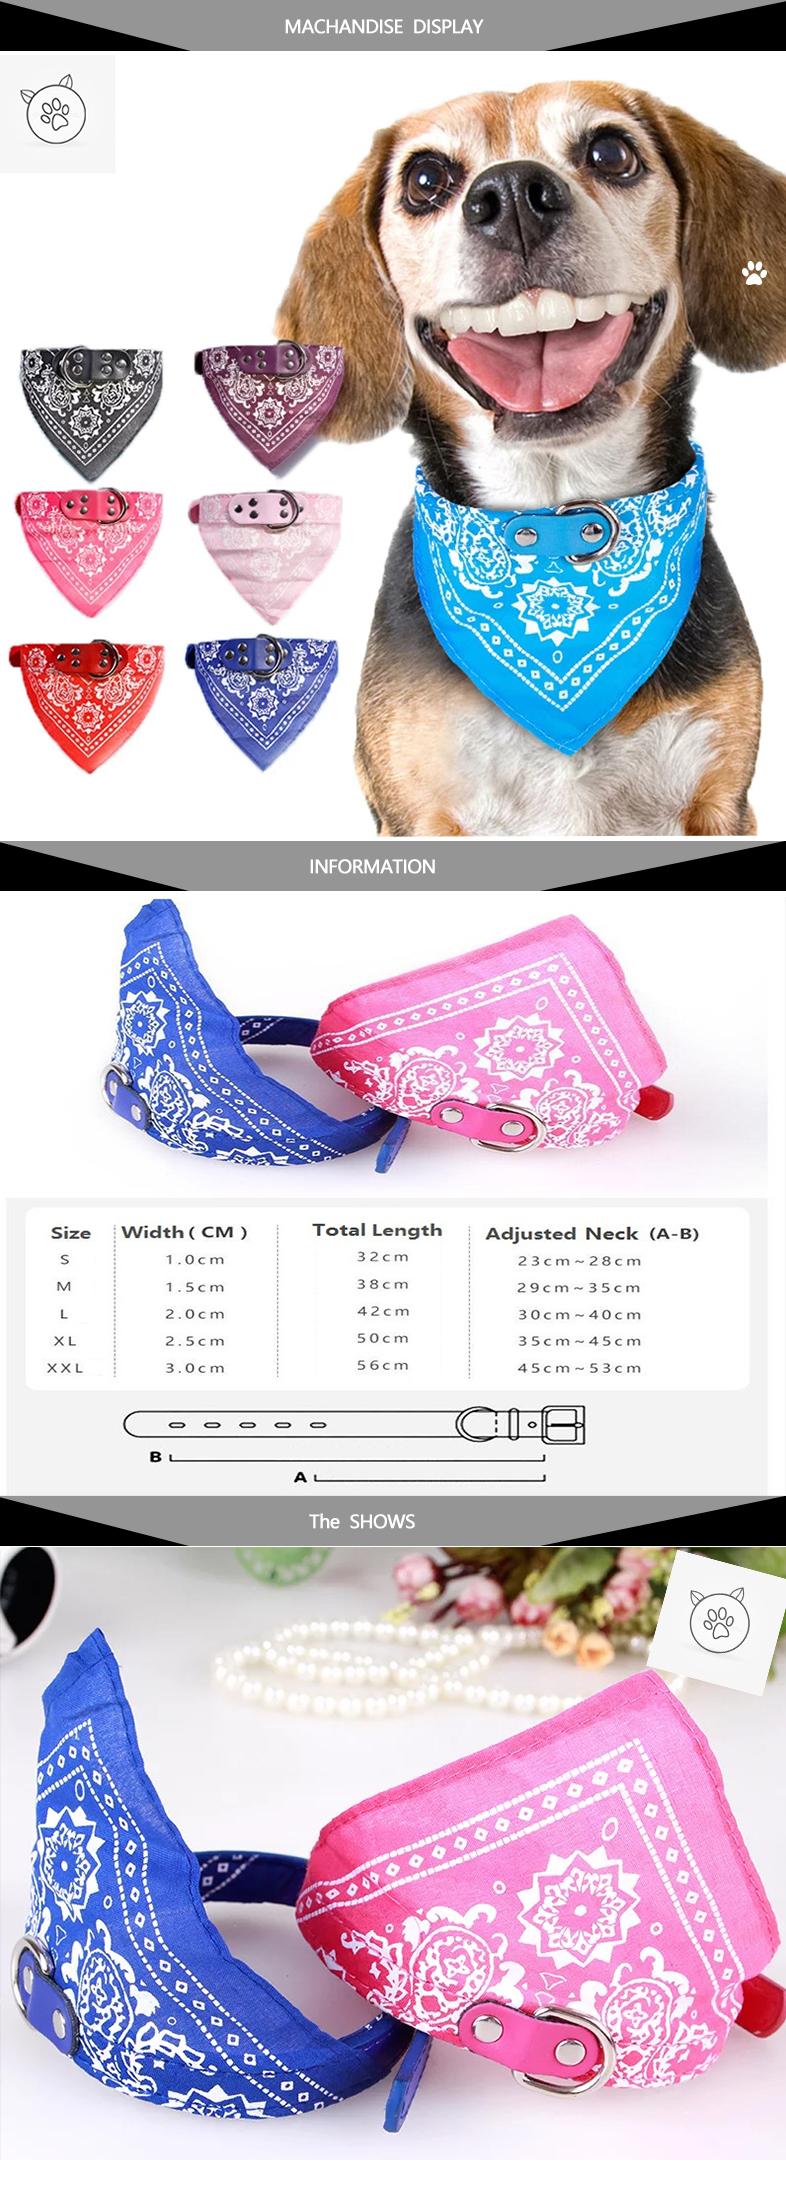 Collar ajustable con paliacate para mascota. 1